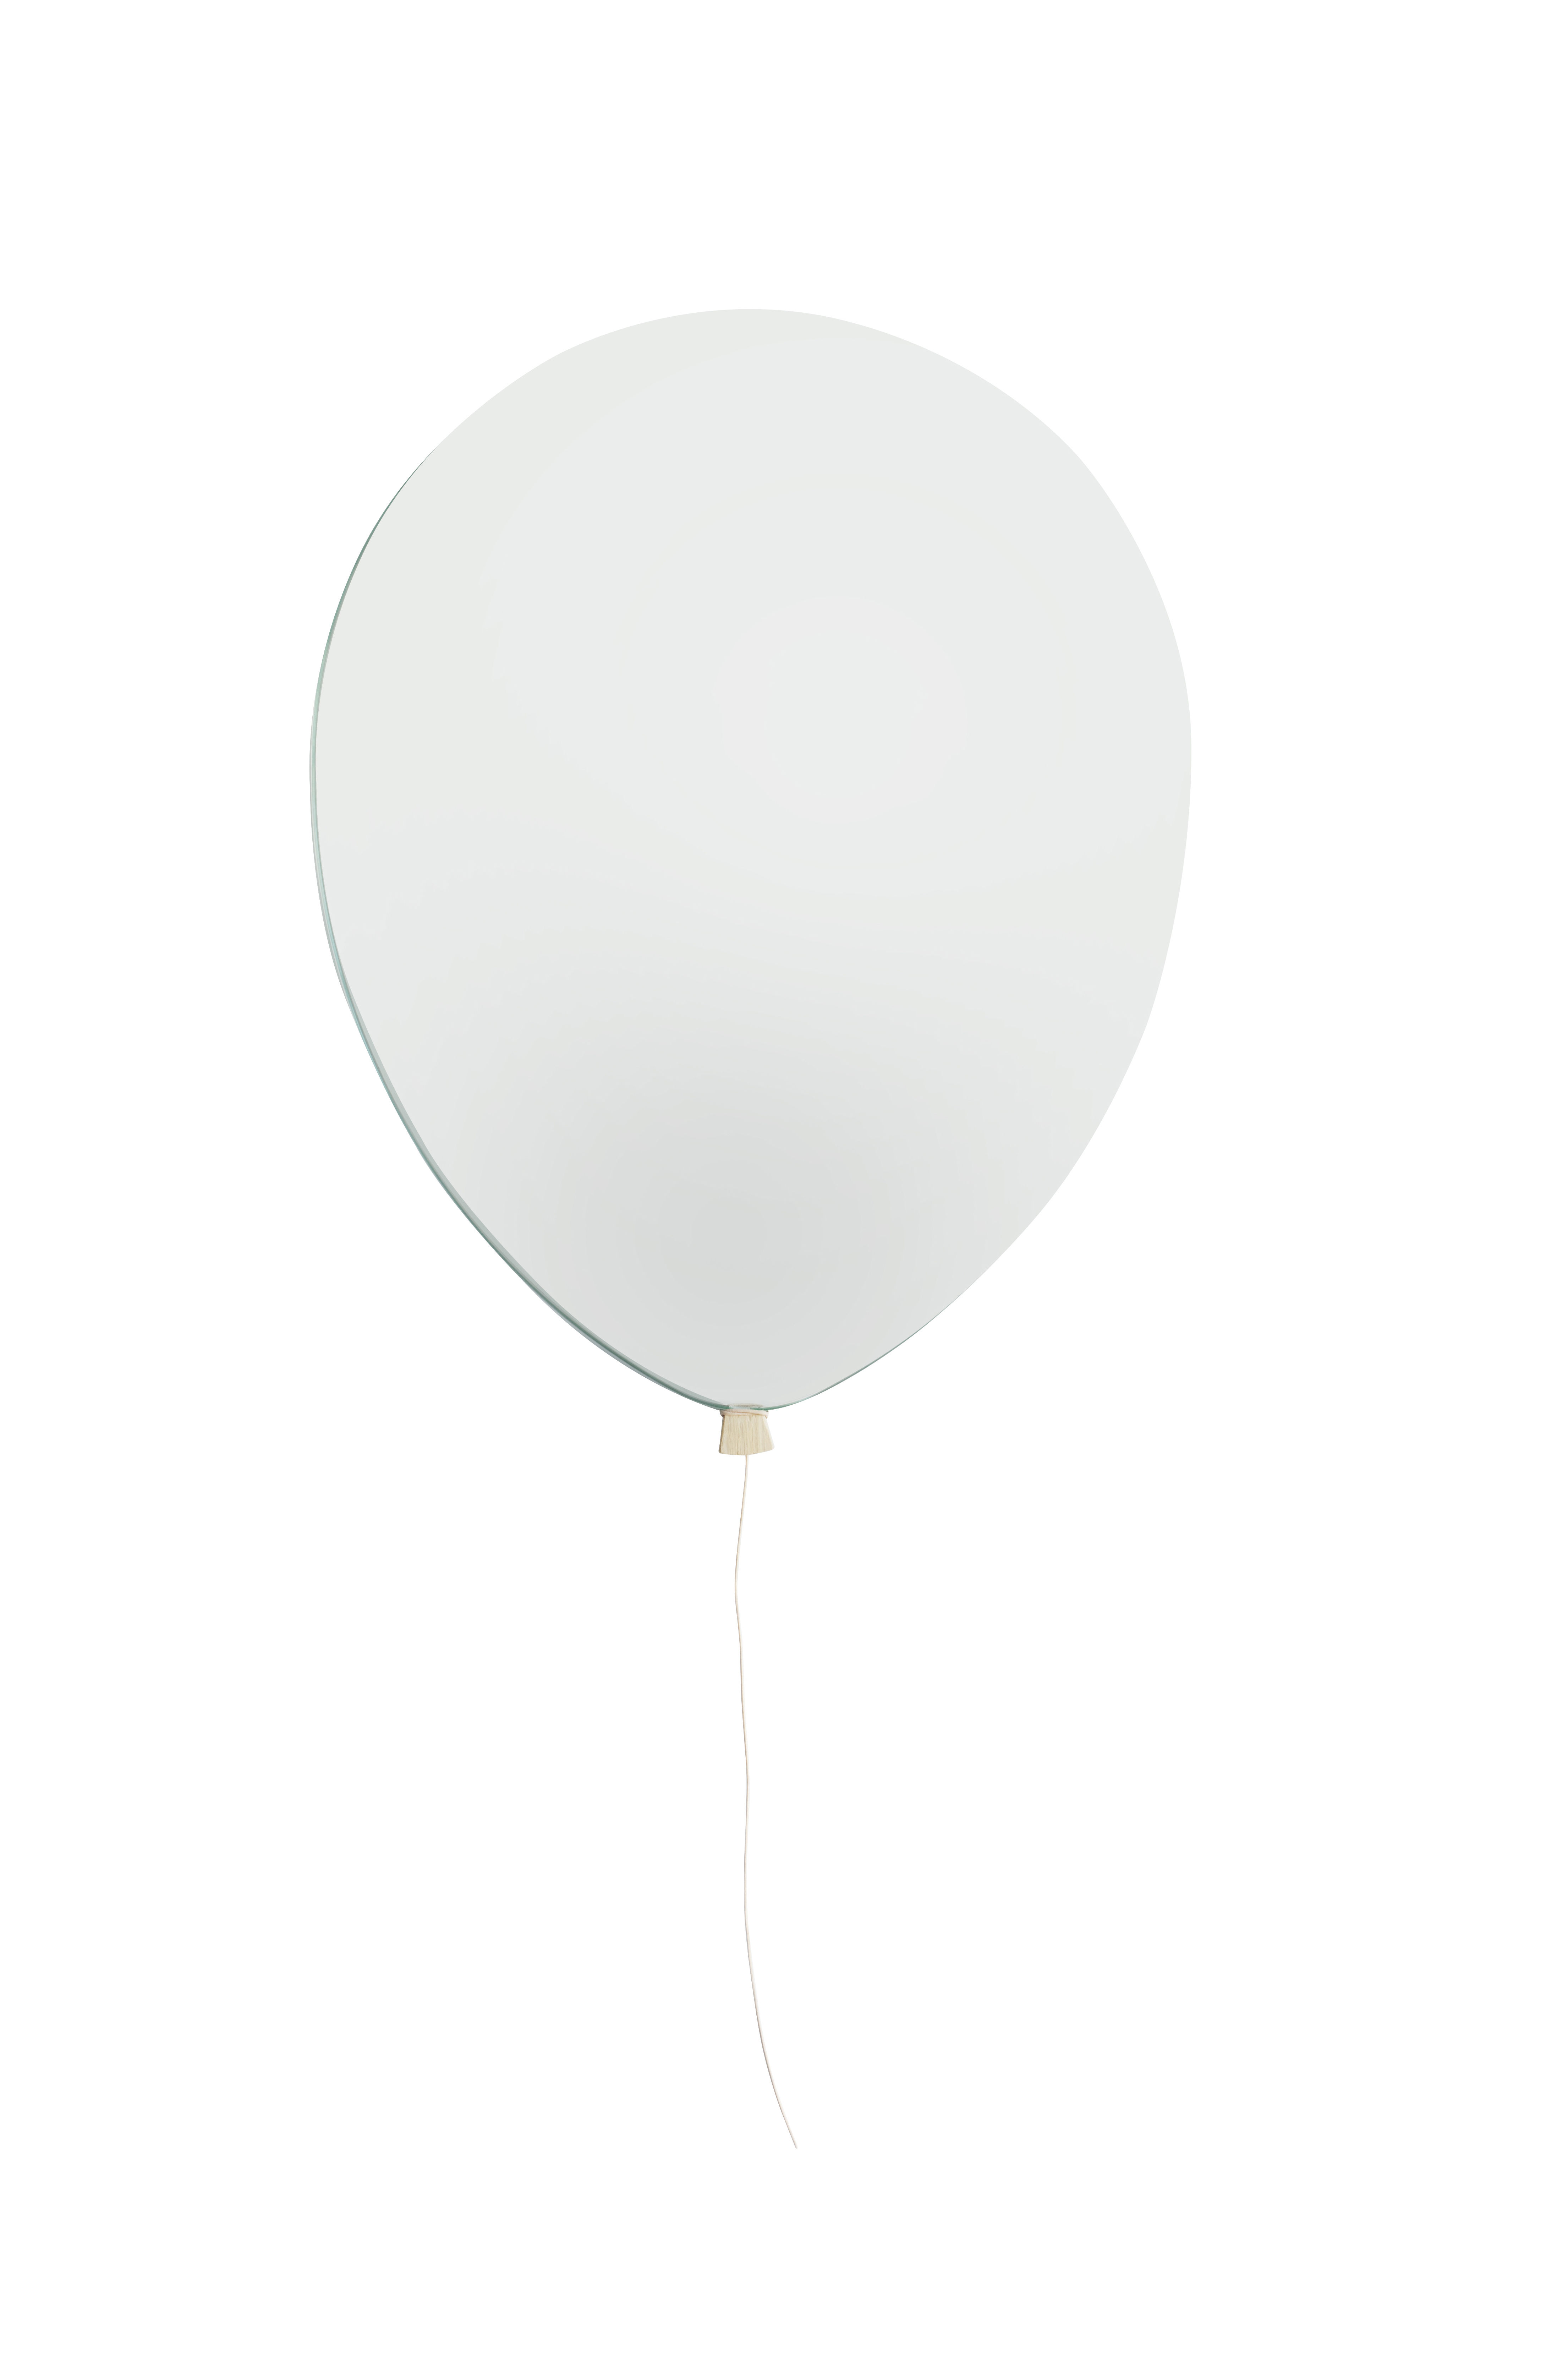 Déco - Pour les enfants - Miroir mural Balloon Small / Larg. 28 x H 36 cm - EO - H 36 cm / Miroir - Chêne, Cuir, Miroir